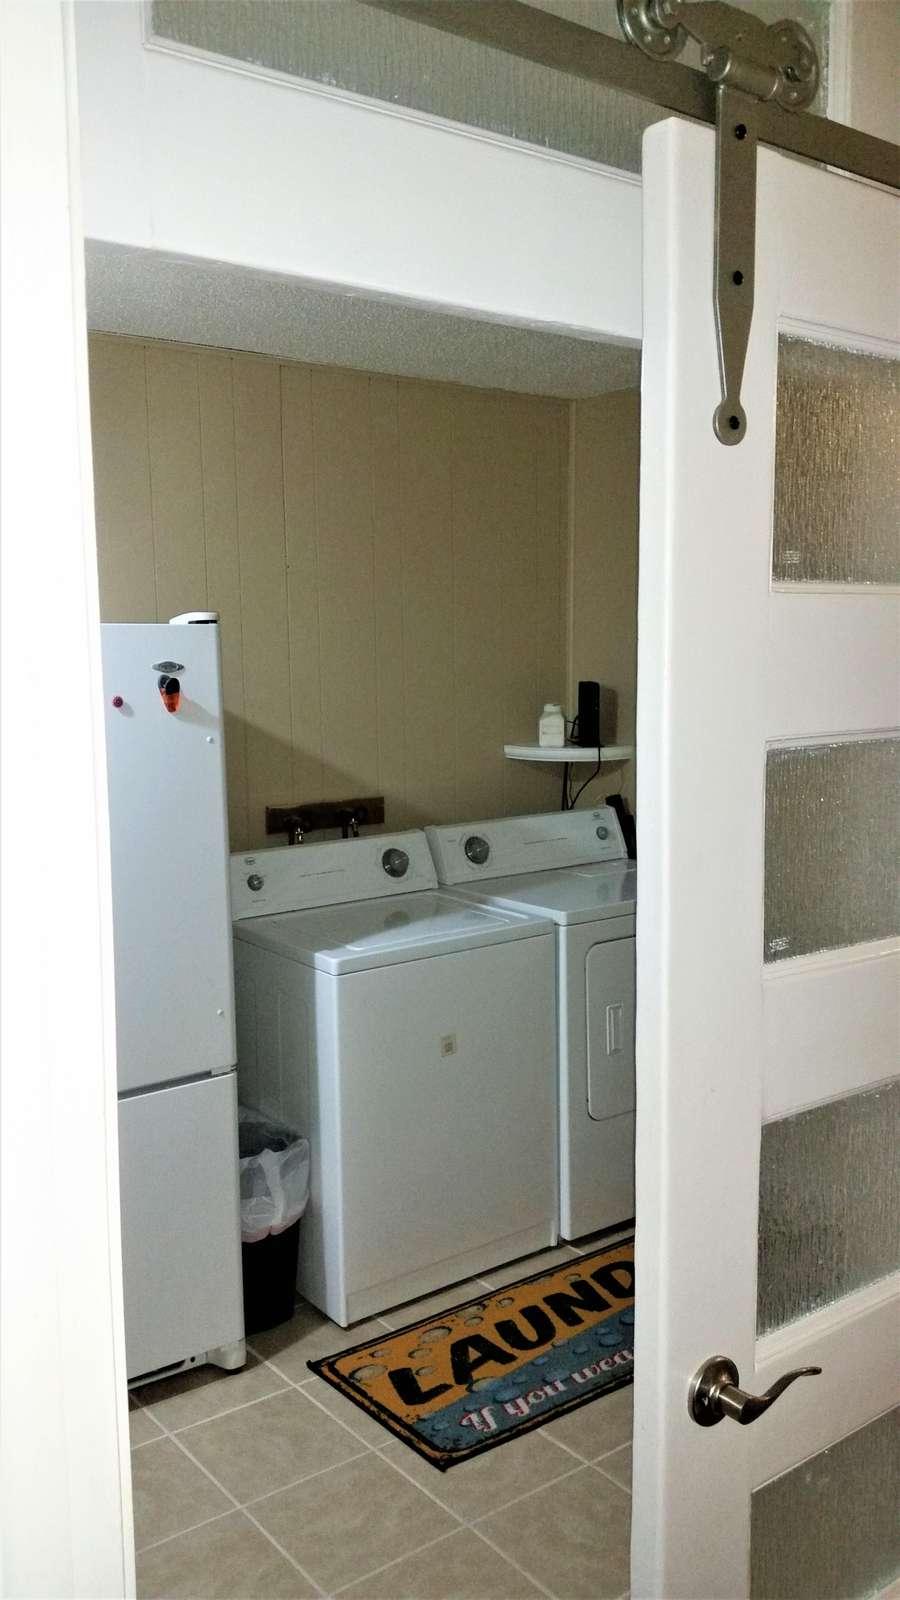 Laundry room with extra refrigerator